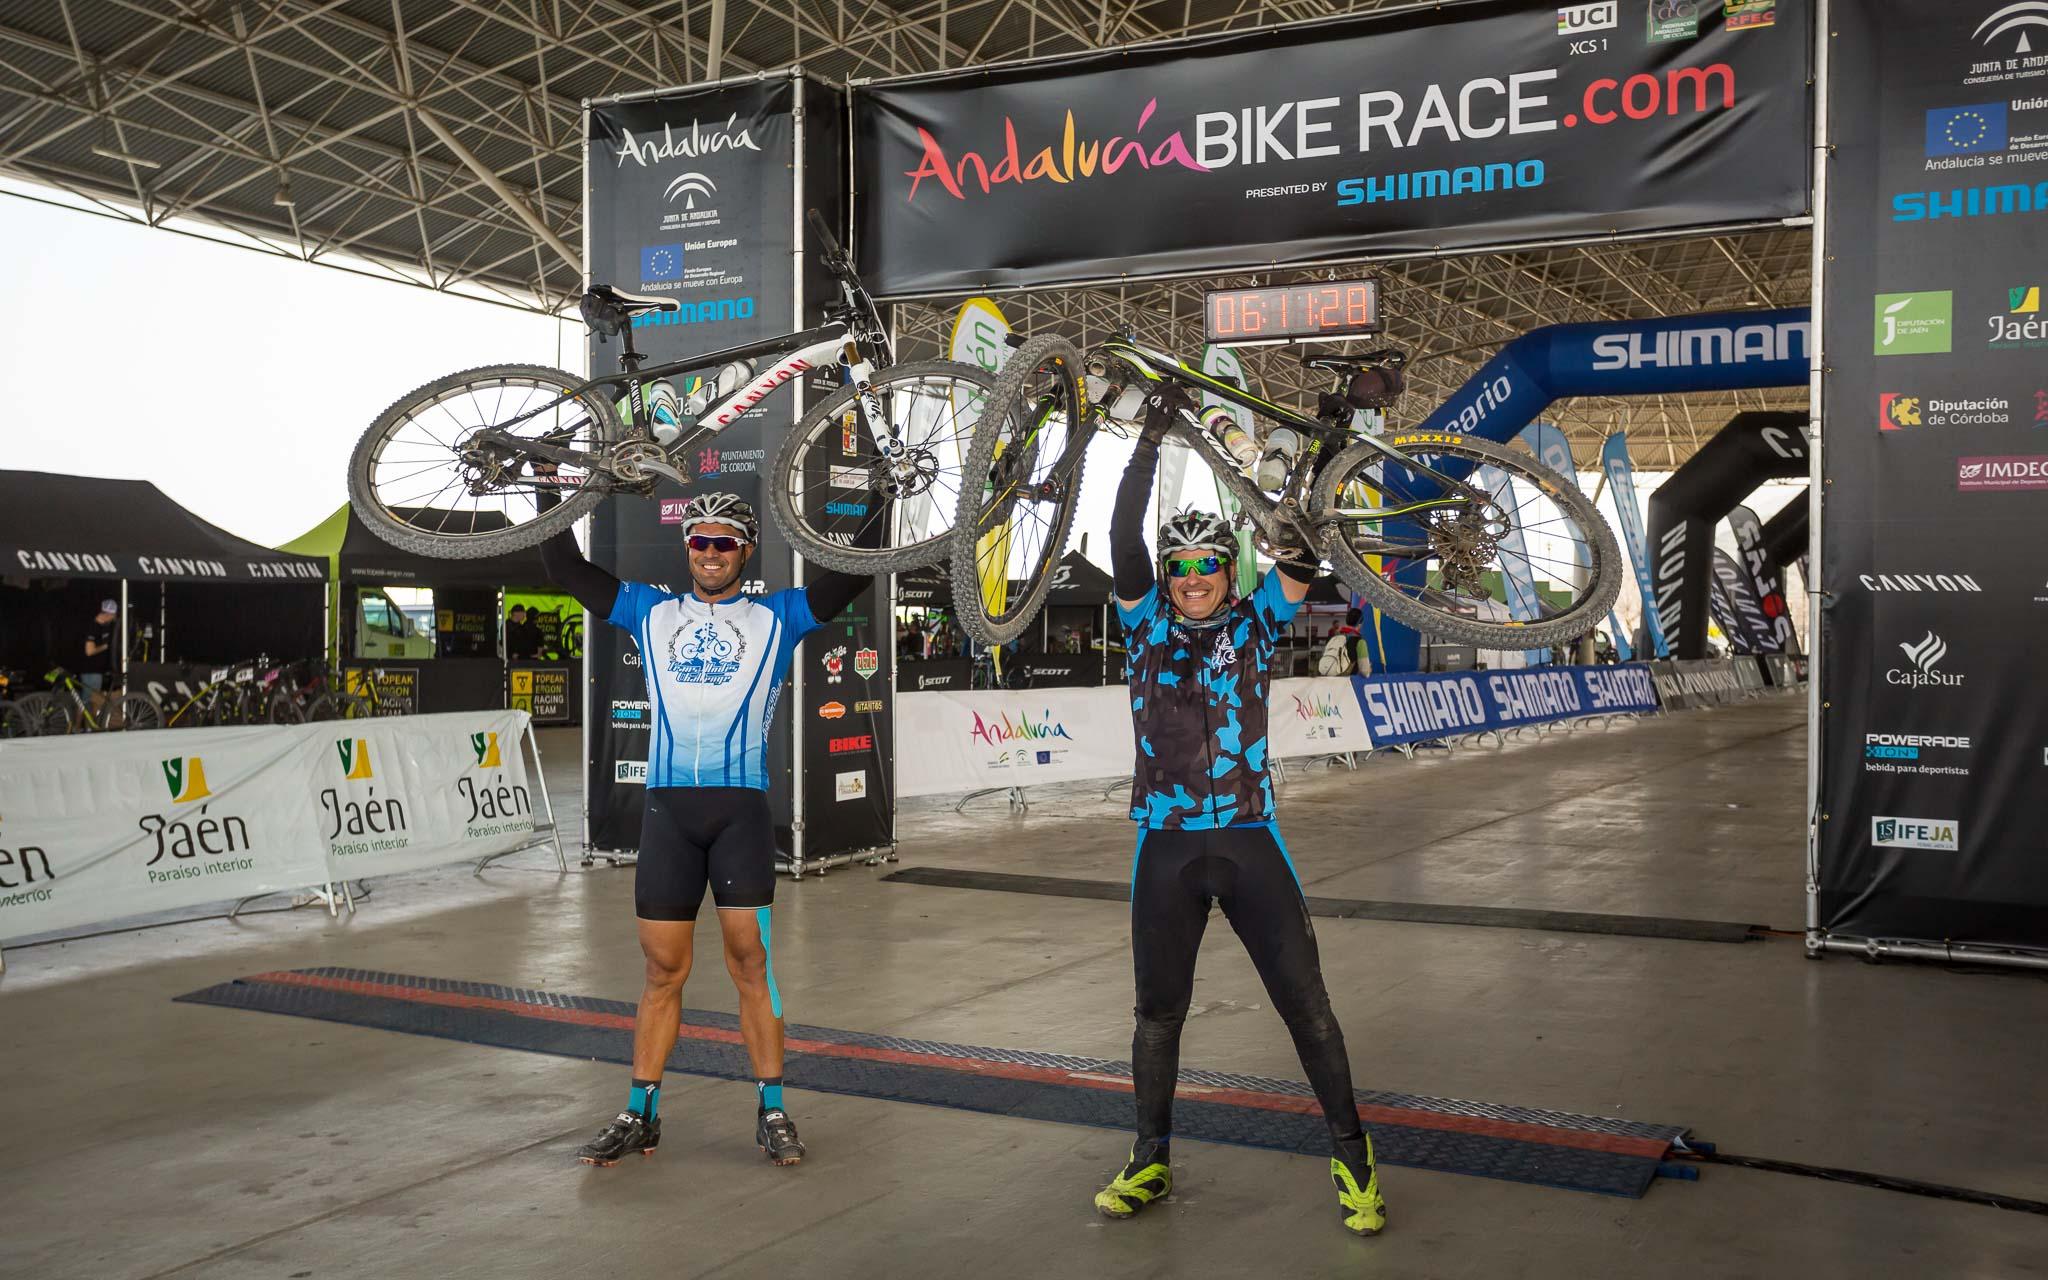 20160222-Andalucia-Bike-Race-2016-B29B0435